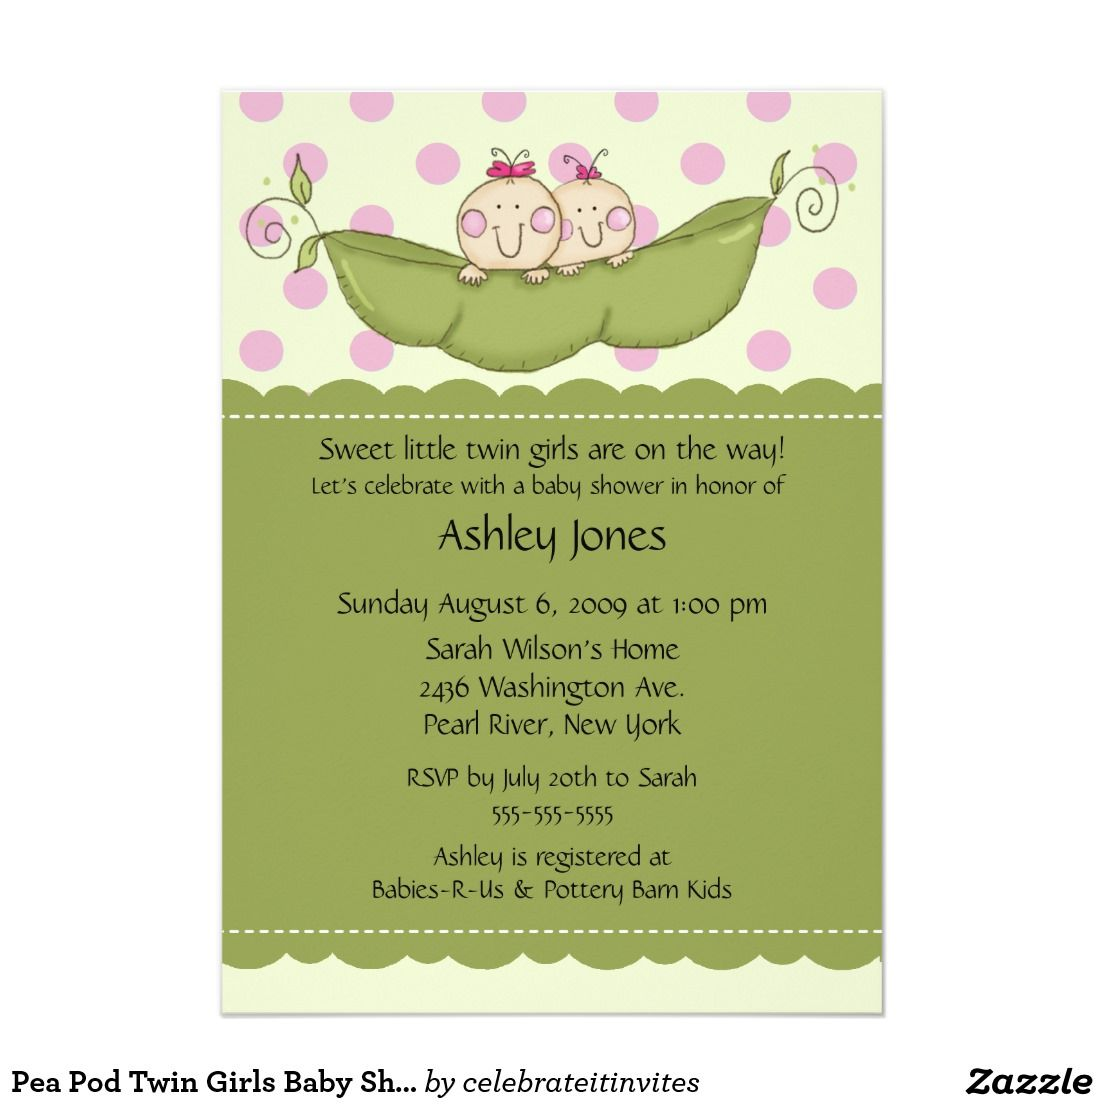 Pea Pod Twin Girls Baby Shower Invitations 5\